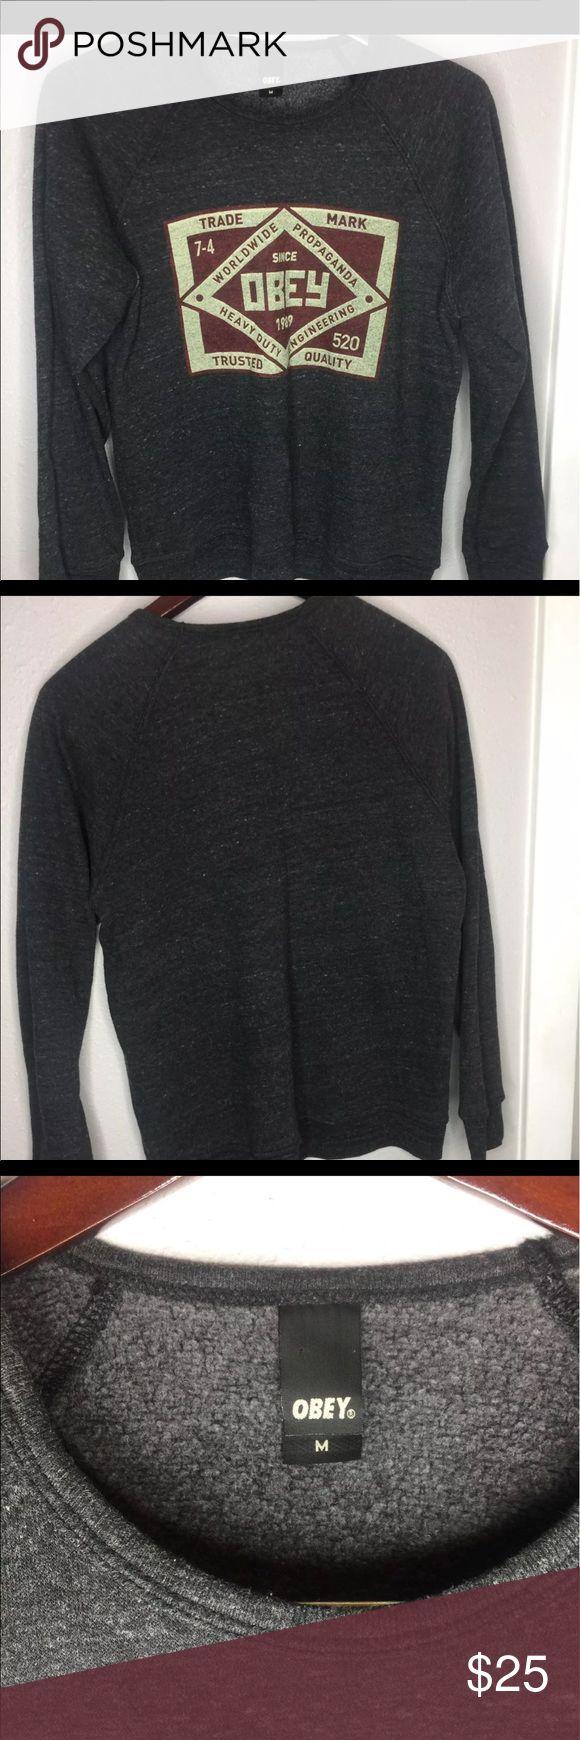 Obey sweatshirt Comfy obey sweatshirt no flaws Obey Tops Sweatshirts & Hoodies